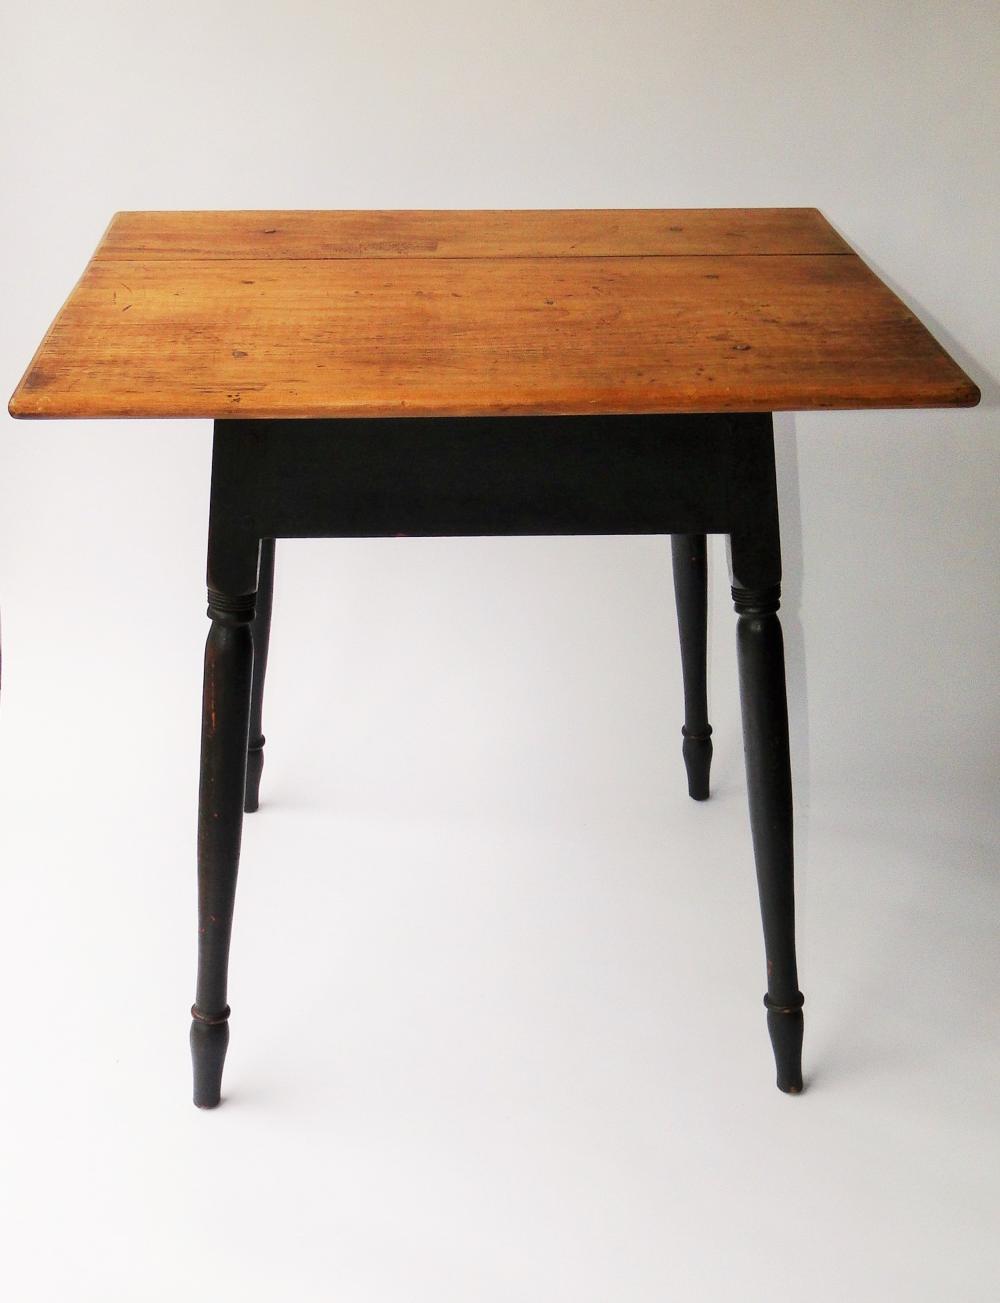 Lot 82: 18TH C QUEEN ANNE TAVERN TABLE